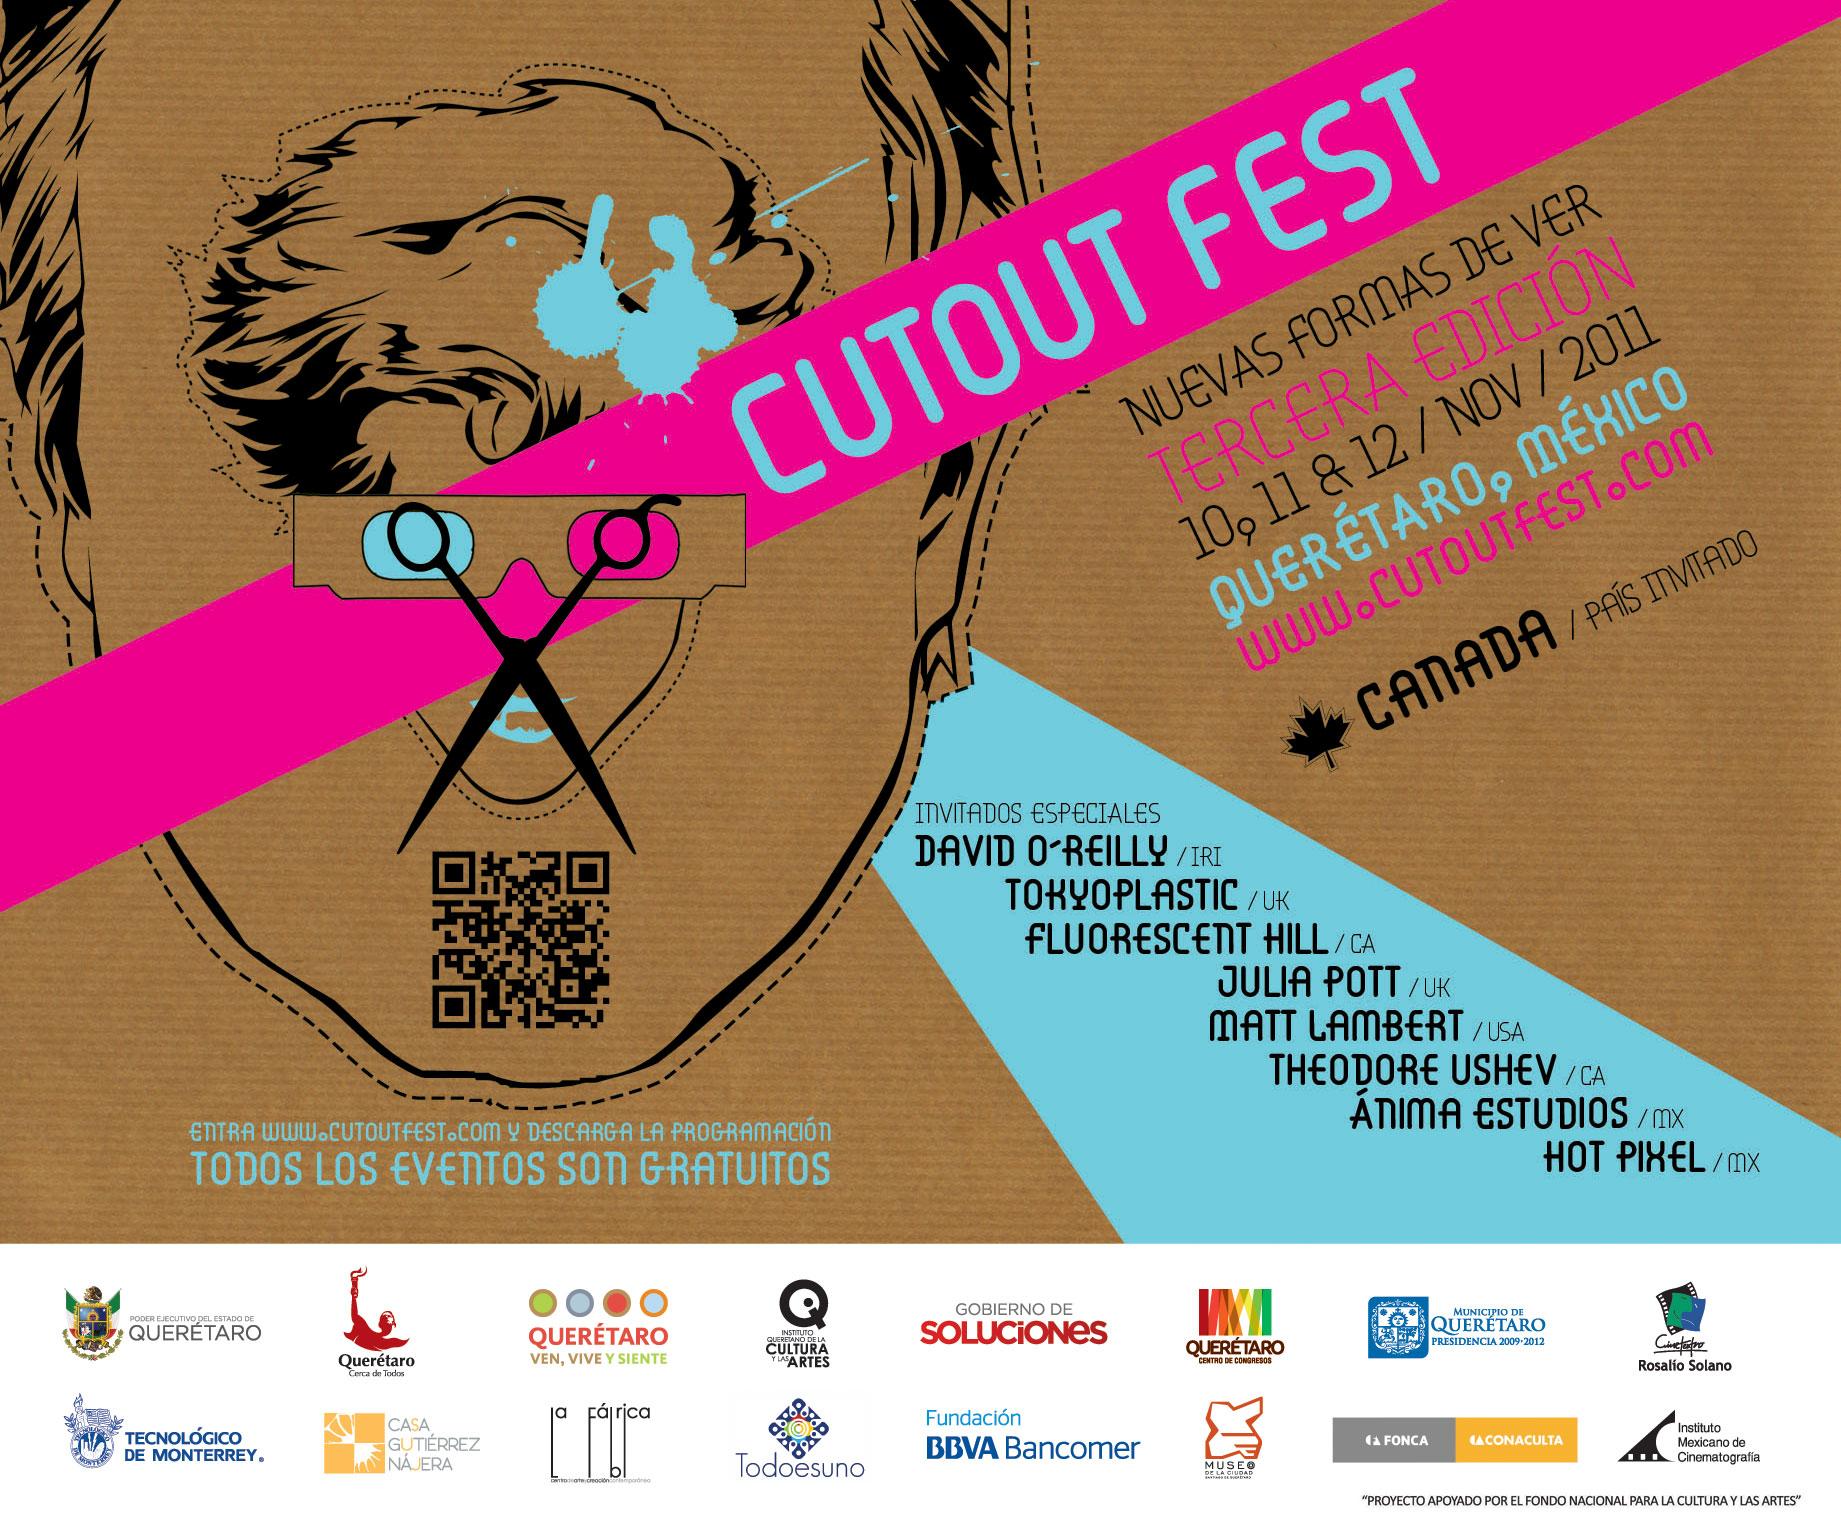 Blinkity Blank: Norman Mclaren: Cutout Fest